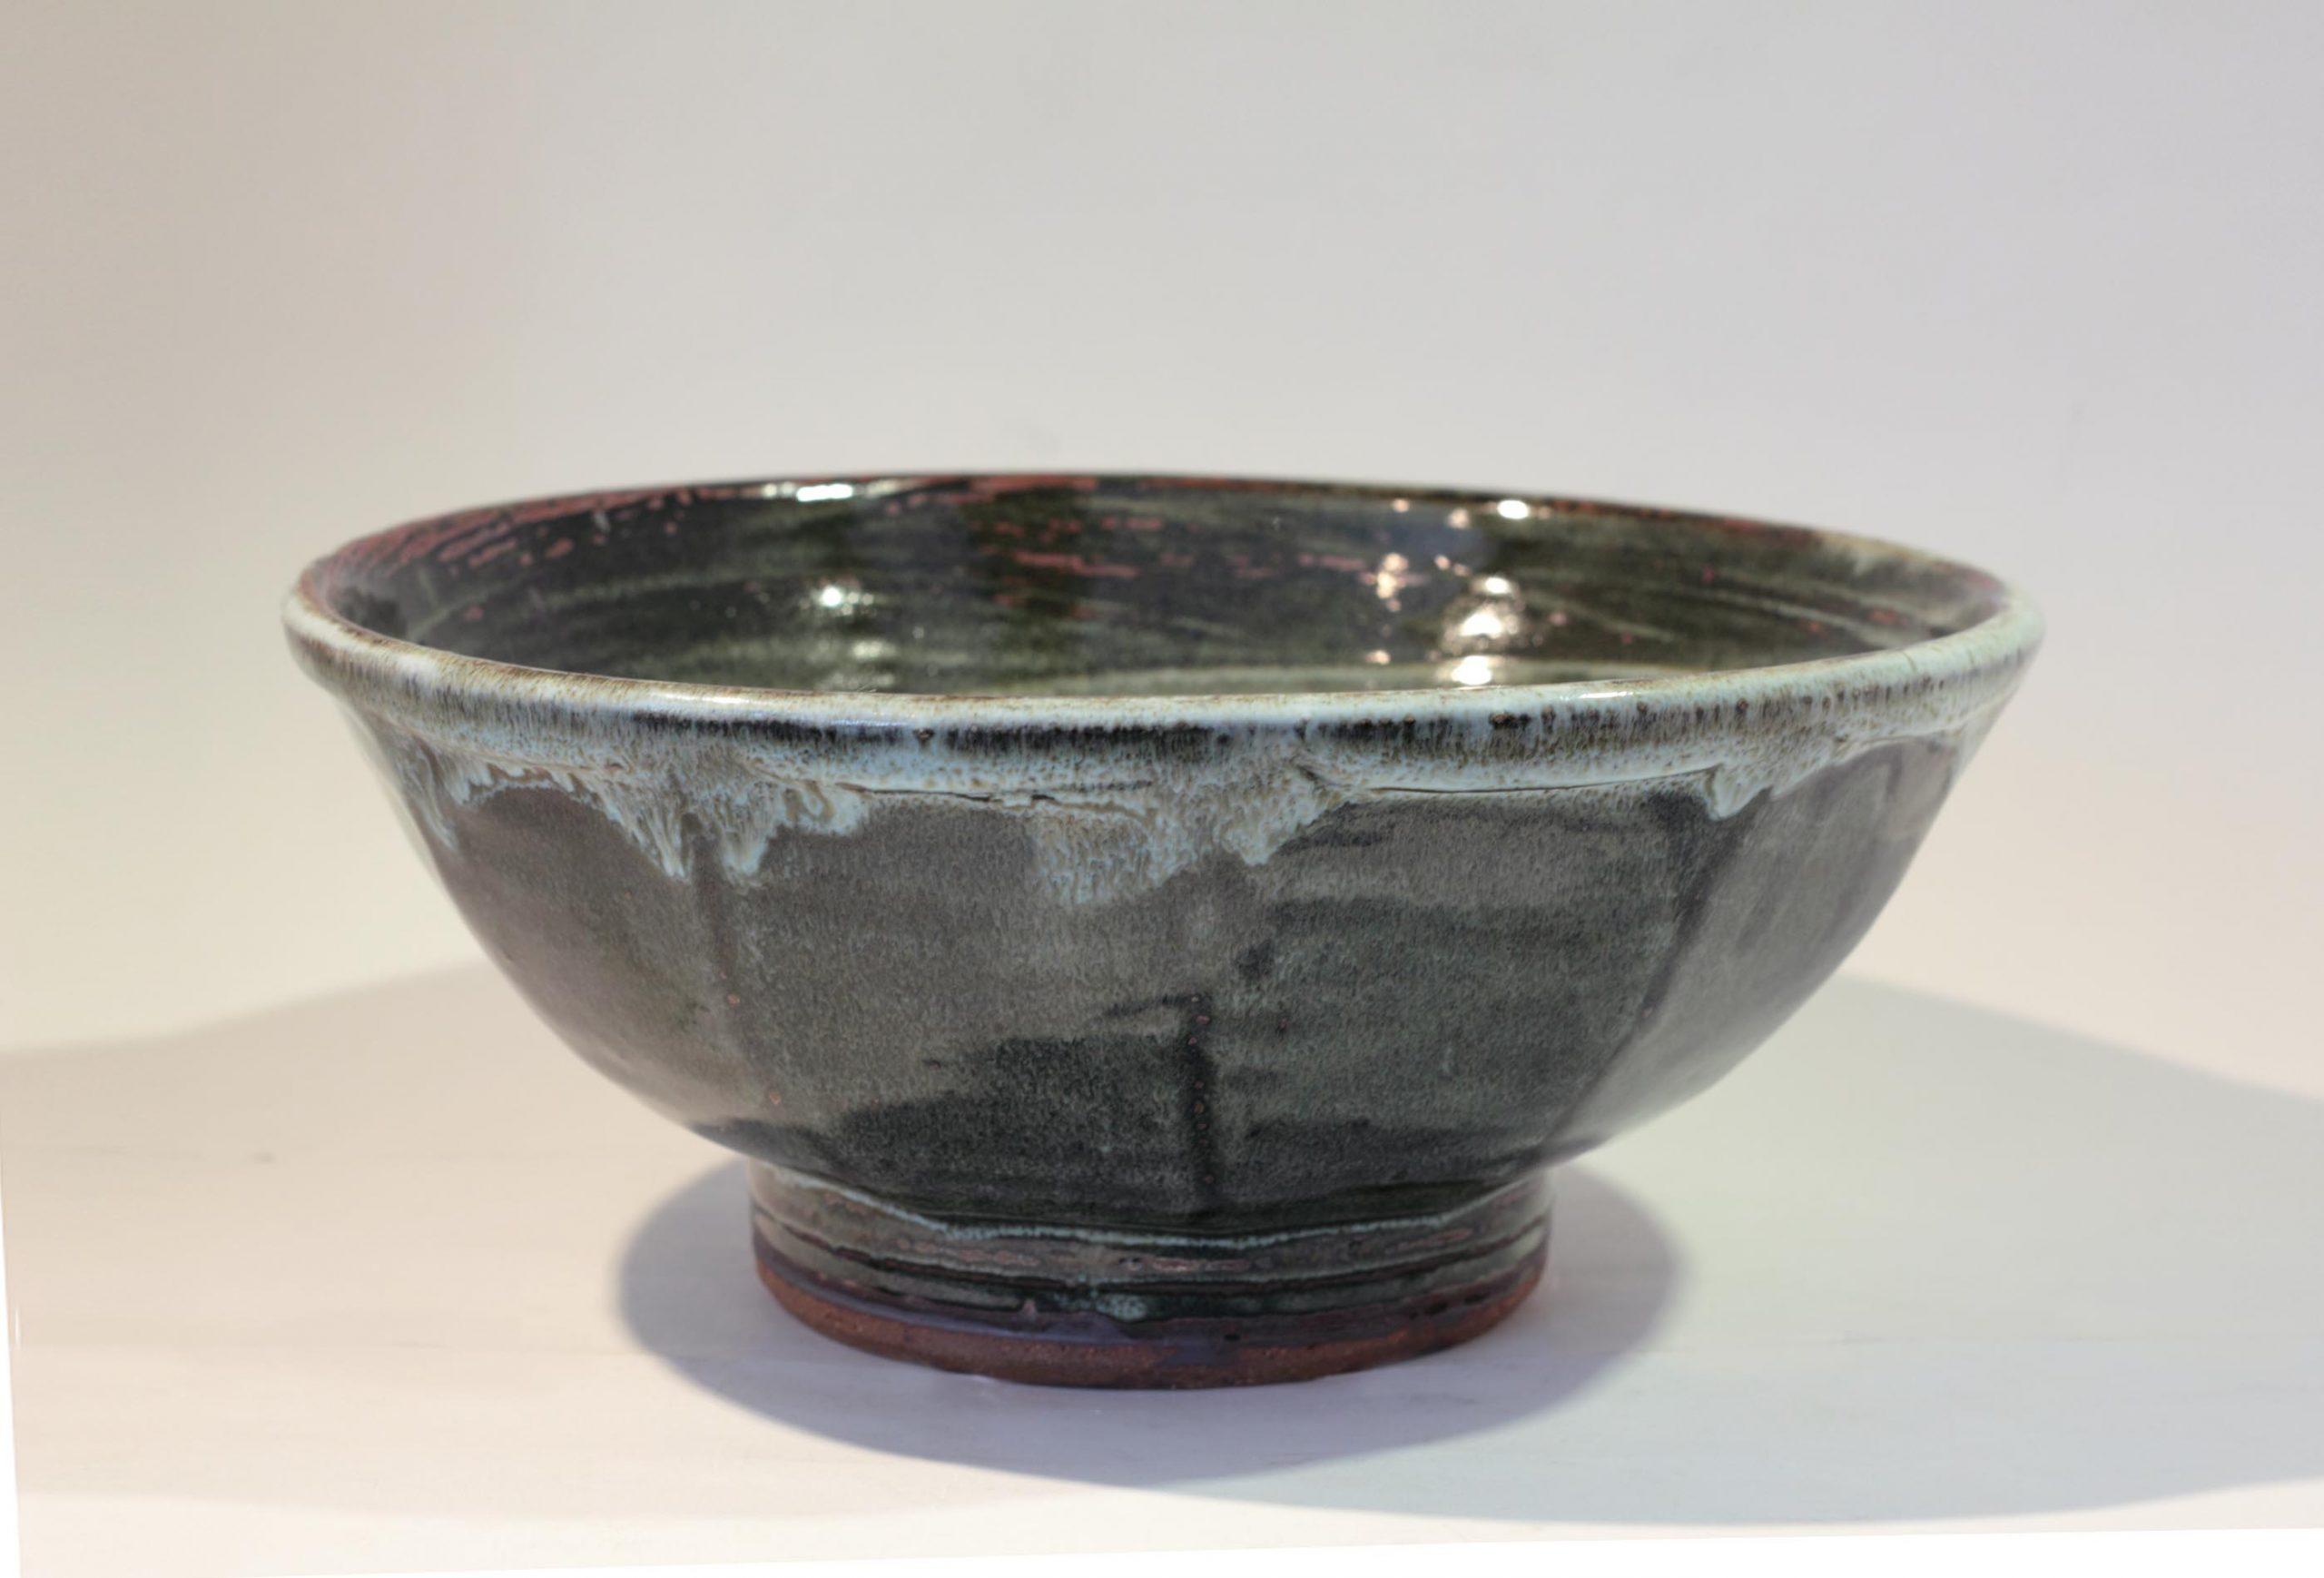 William Plumptre 20. Cut Sided Bowl, Stoneware 13x26cm